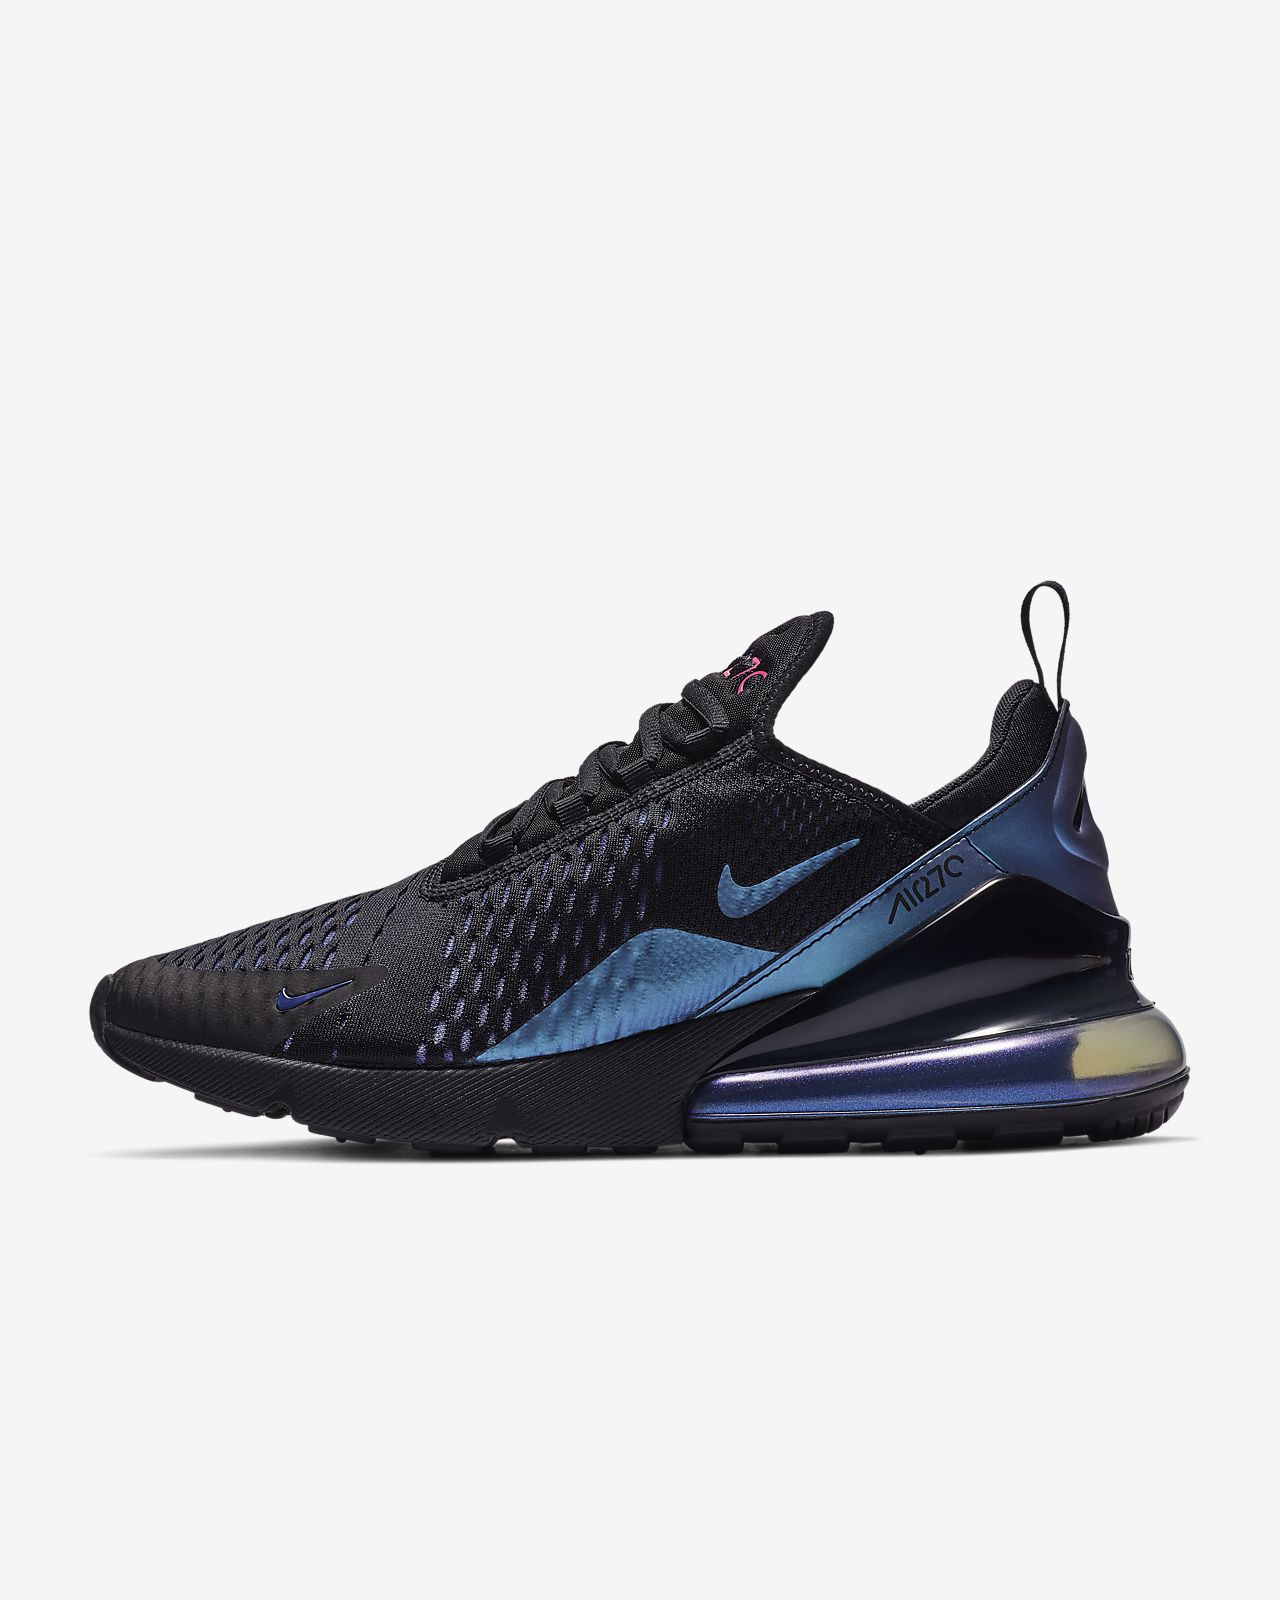 new style a2f19 4cfda ... Nike Air Max 270 – sko til mænd